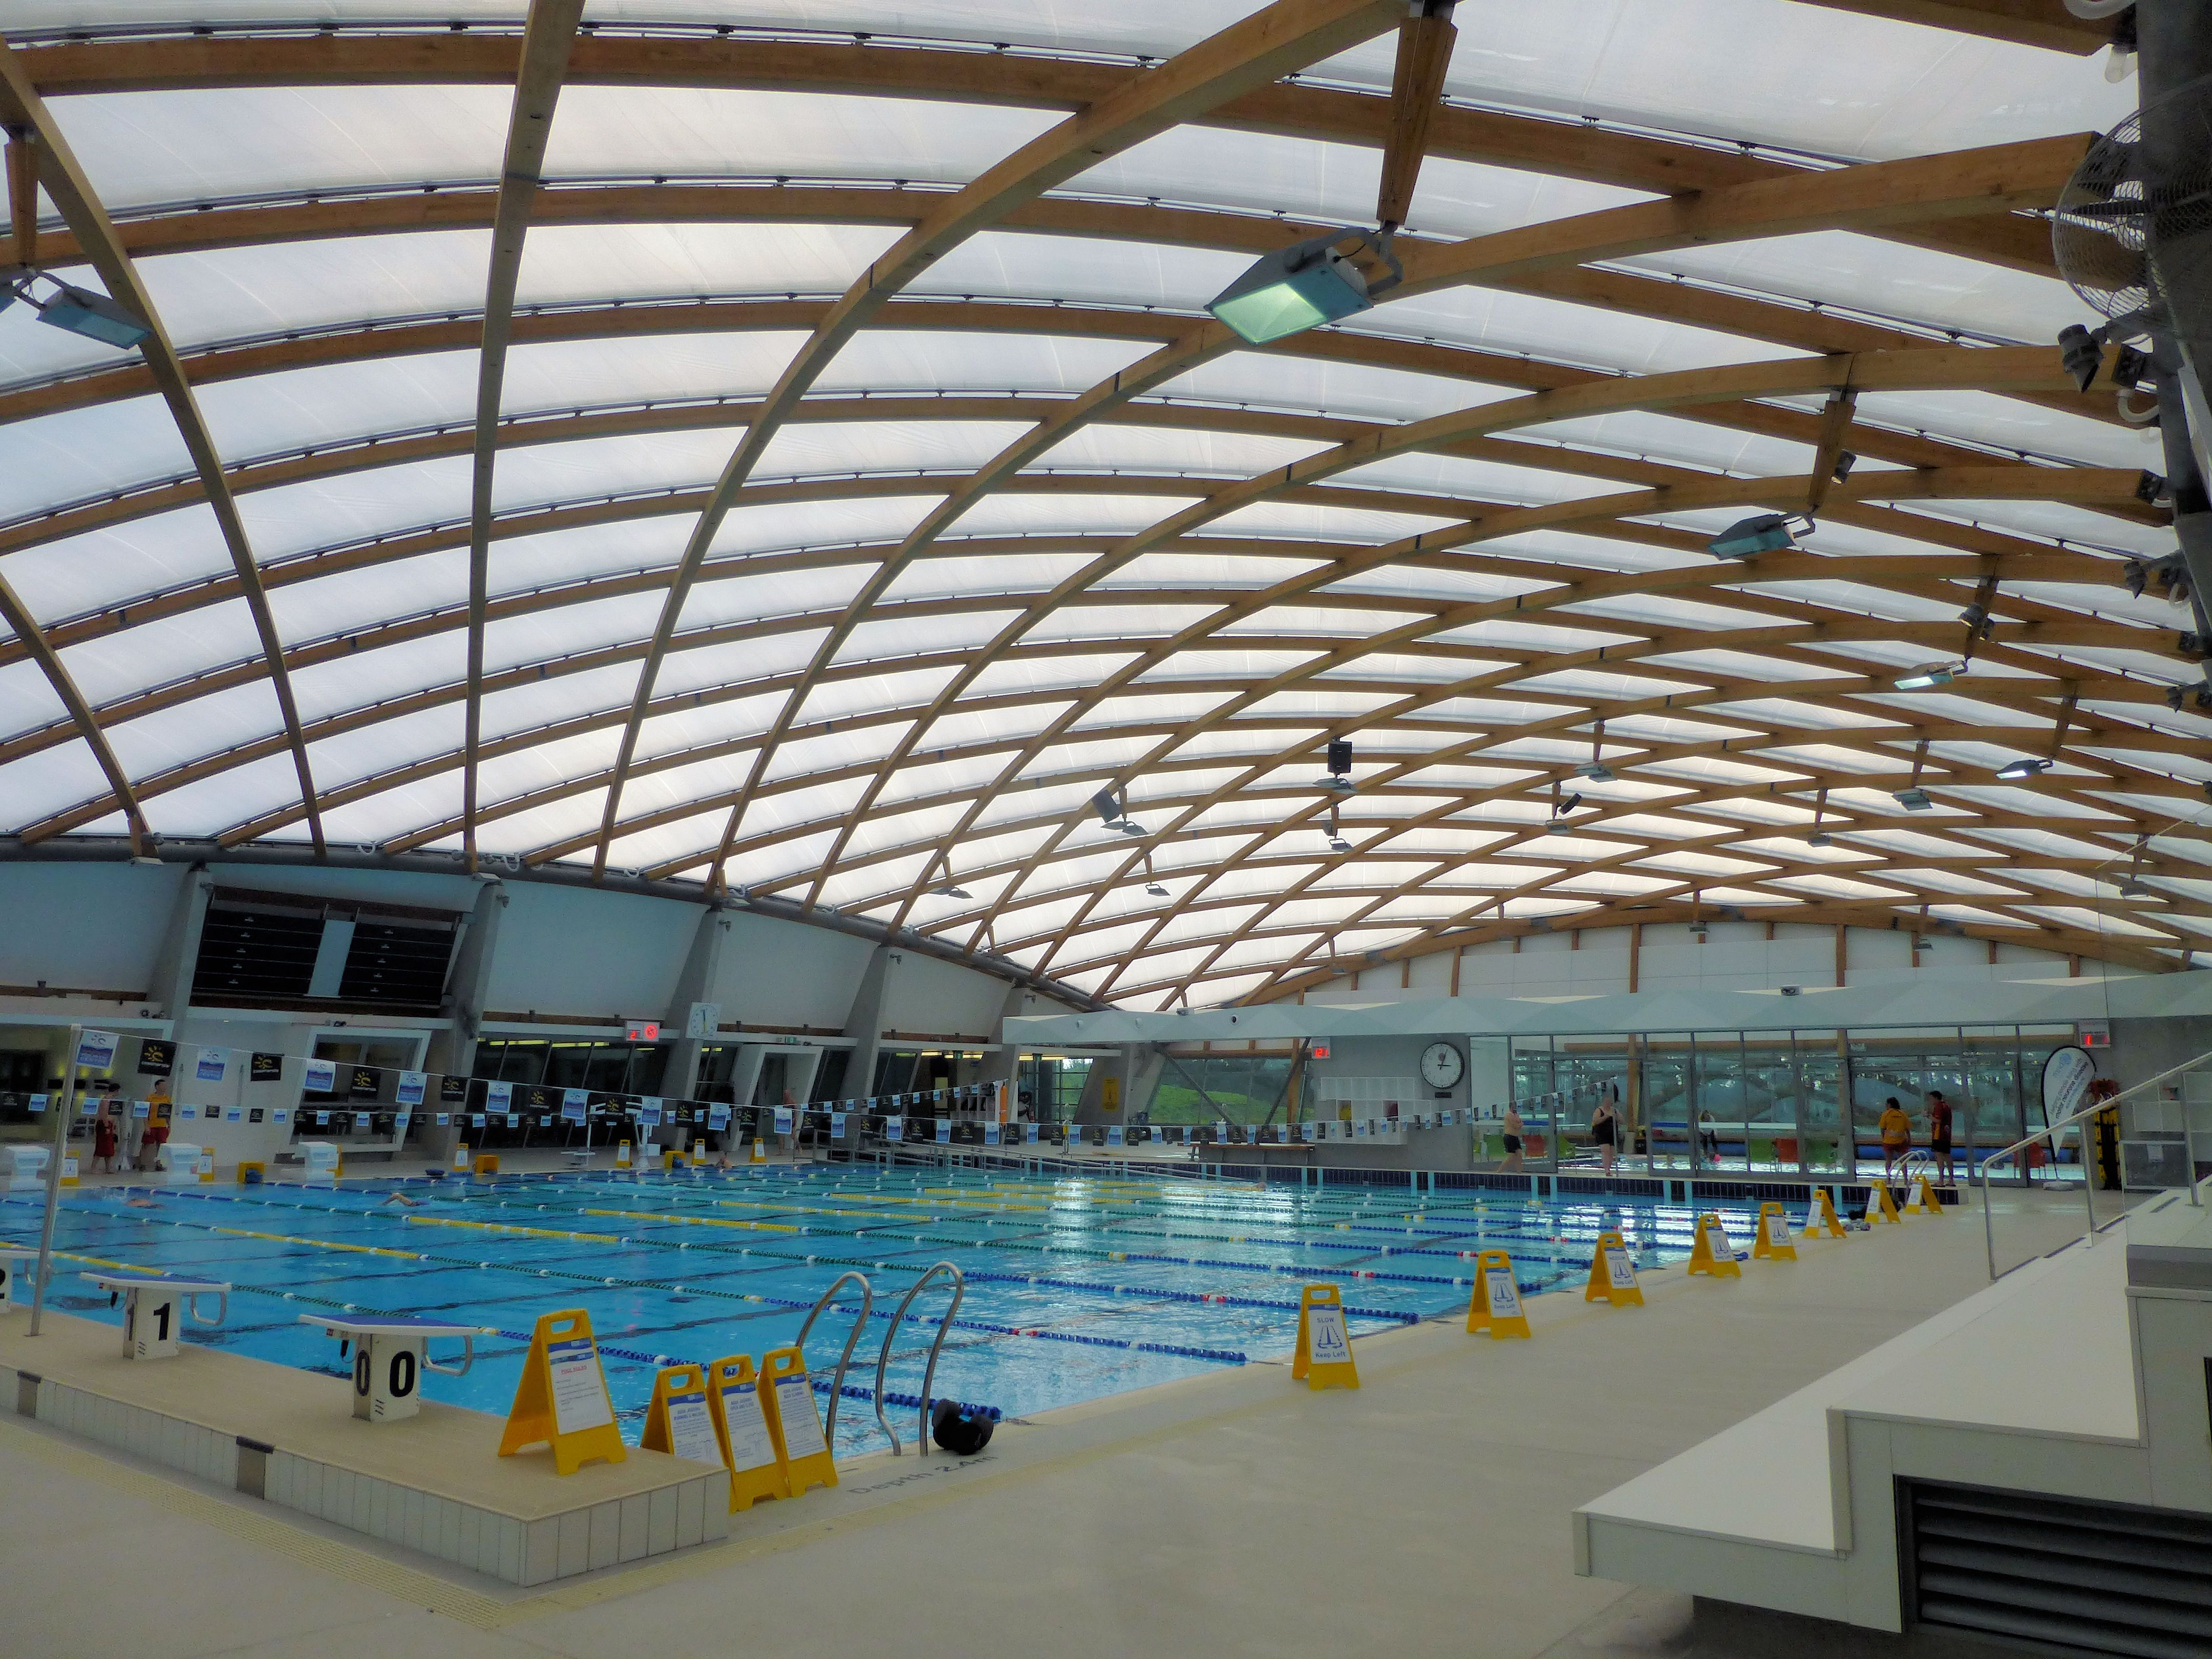 Kapiti coast aquatic centre curved gridshell glulam roof for Piscina valdesanchuela